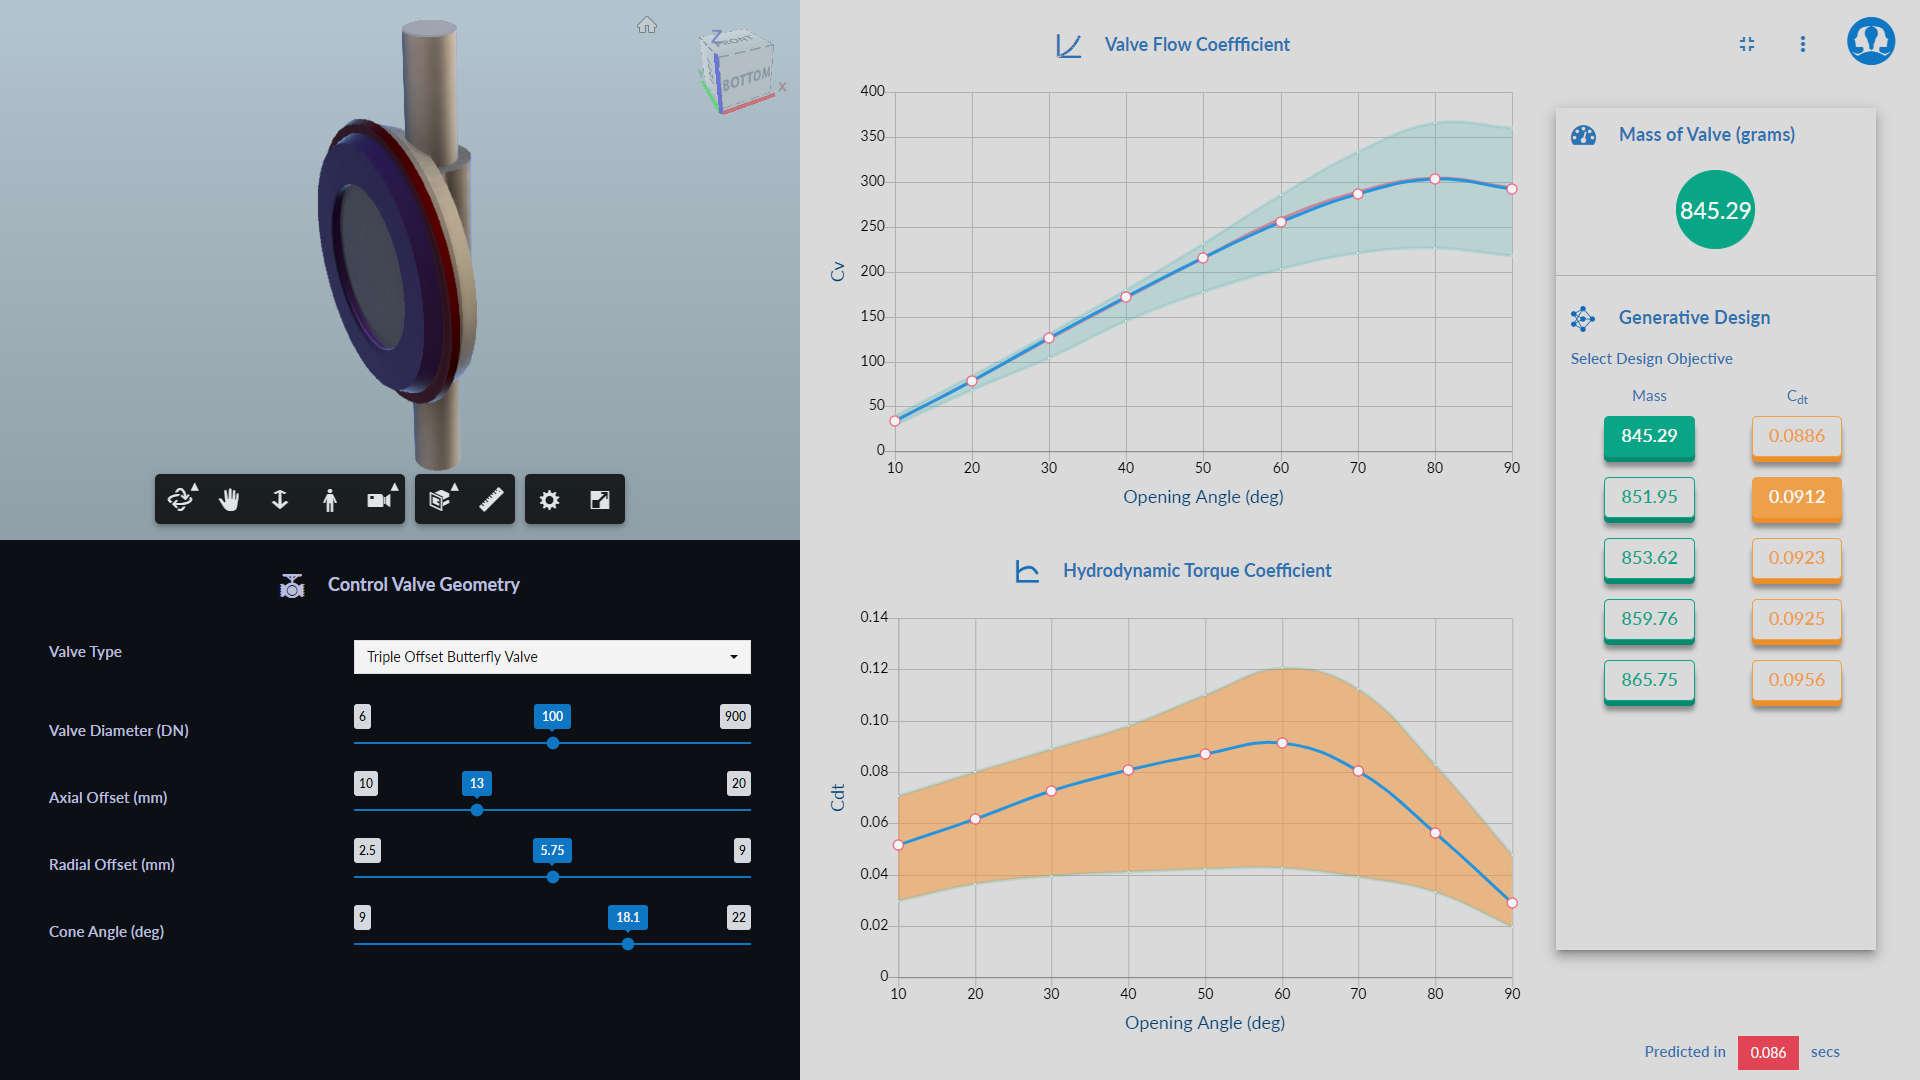 simulationHub's valve design using Machine Learning - ML application